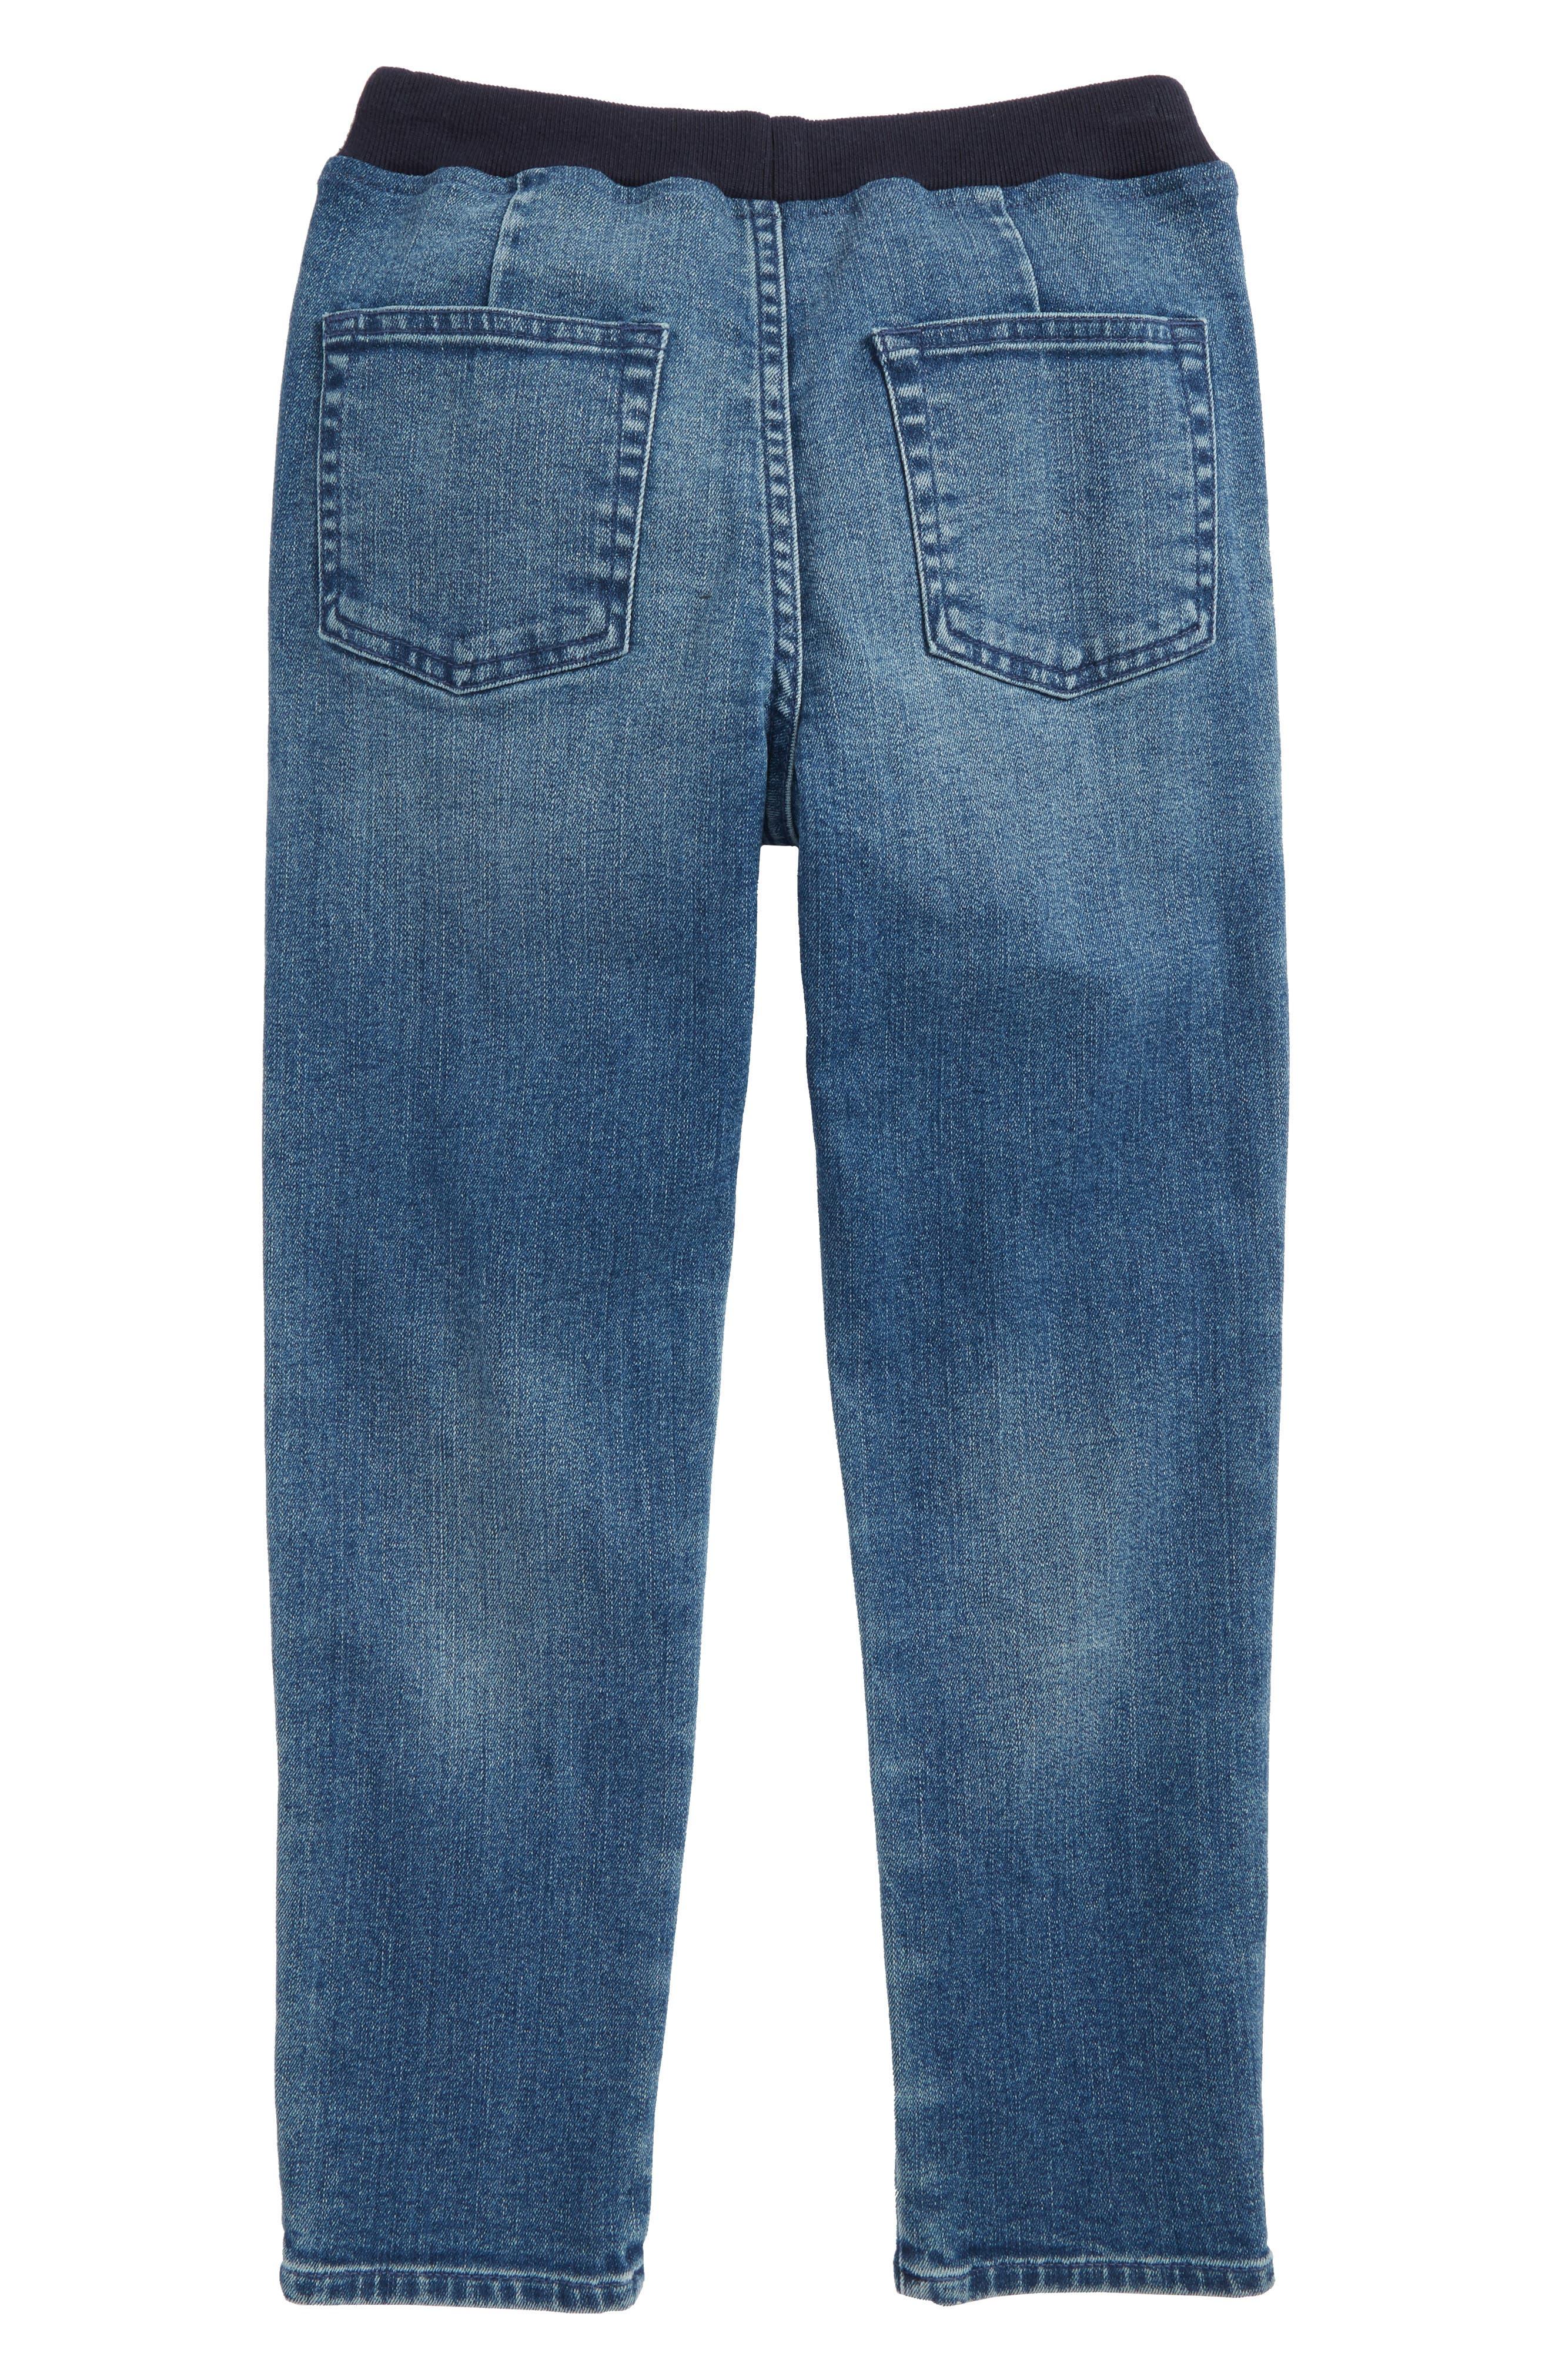 Pull-On Denim Pants,                             Alternate thumbnail 2, color,                             400